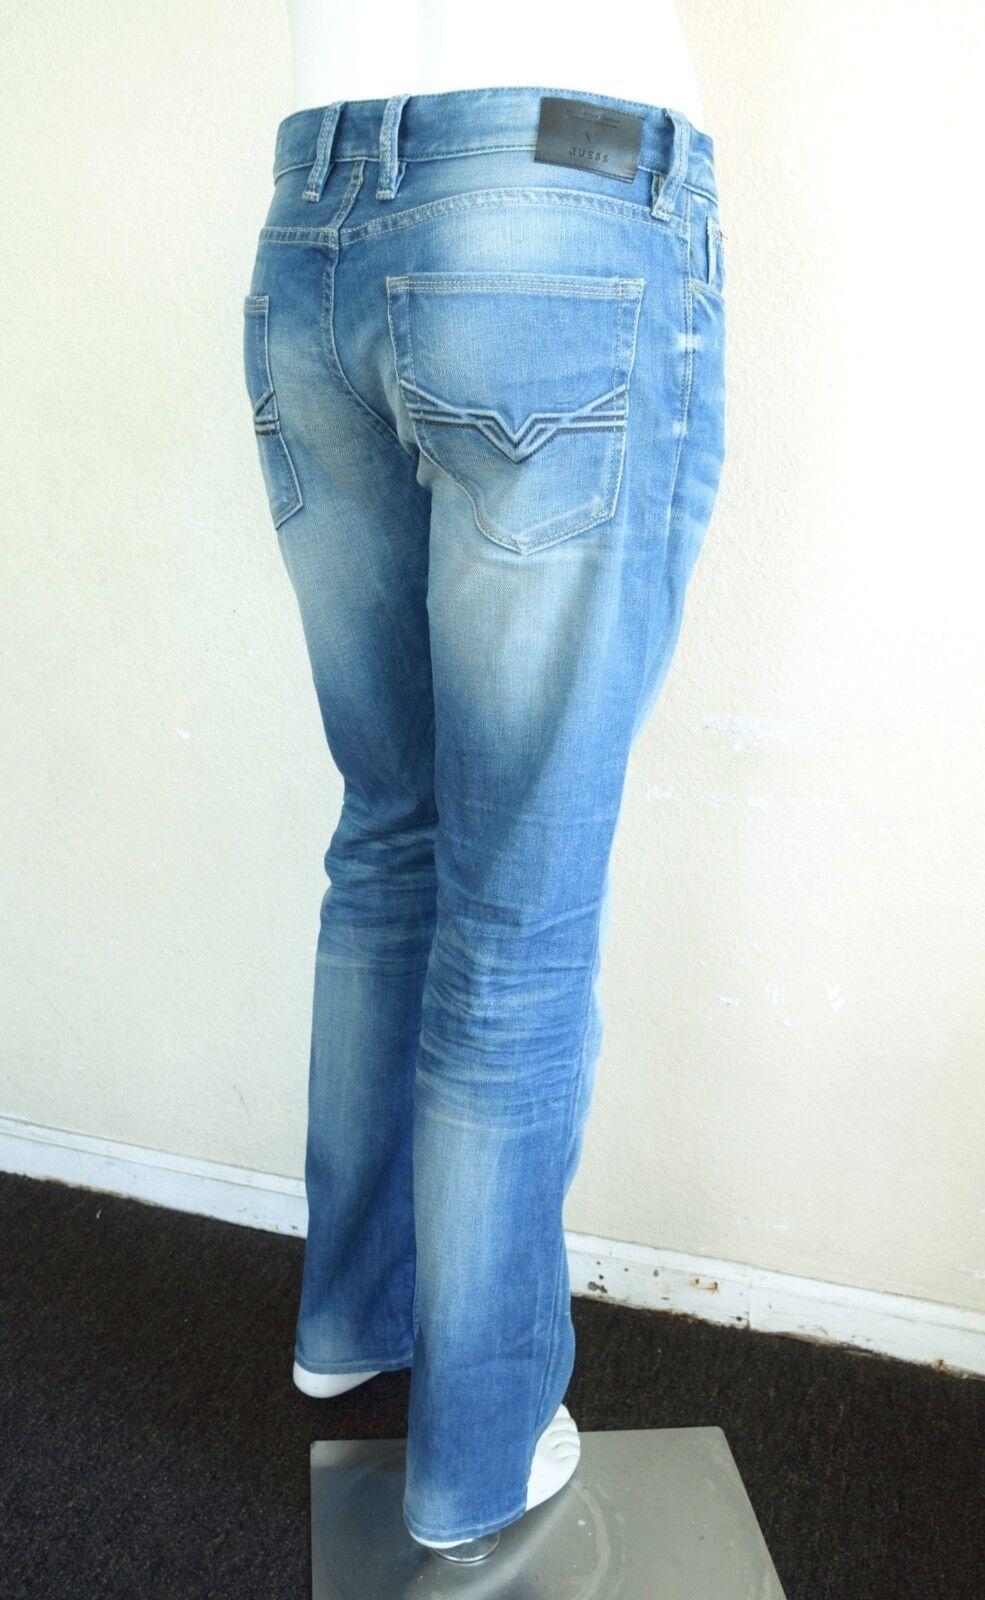 GUESS Men's Slim Straight Jeans – Medium bluee Wash sz 32